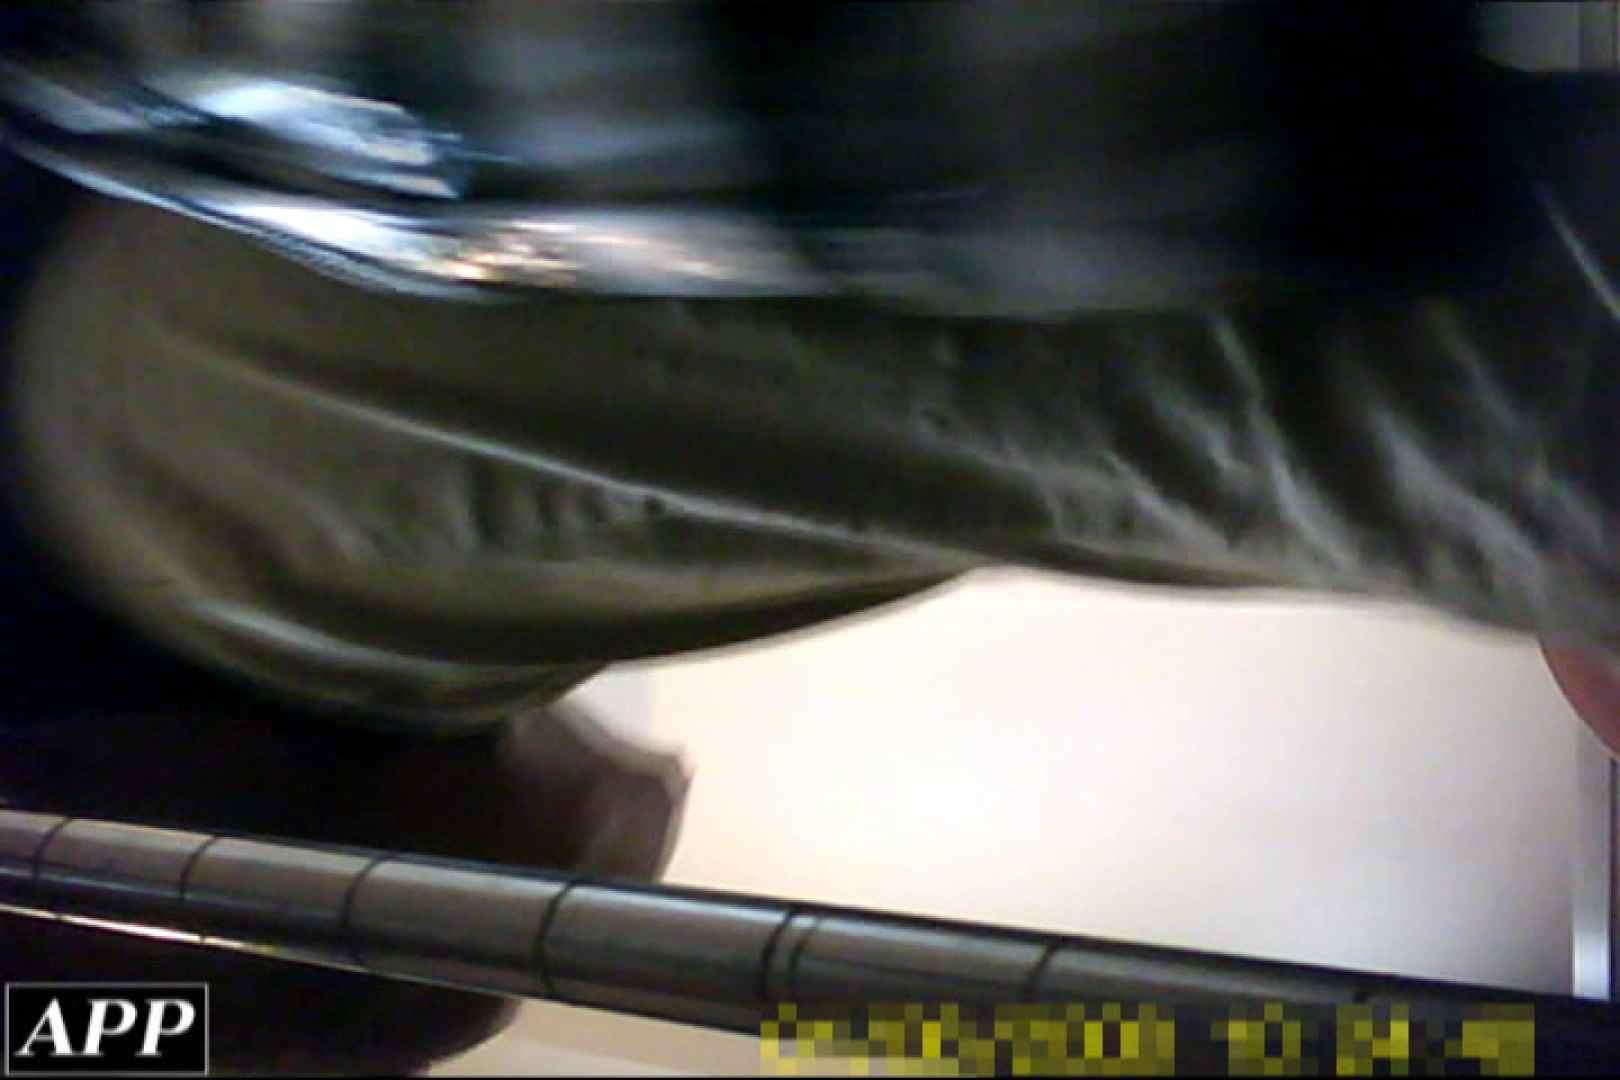 3視点洗面所 vol.087 OLエロ画像  83PICs 32